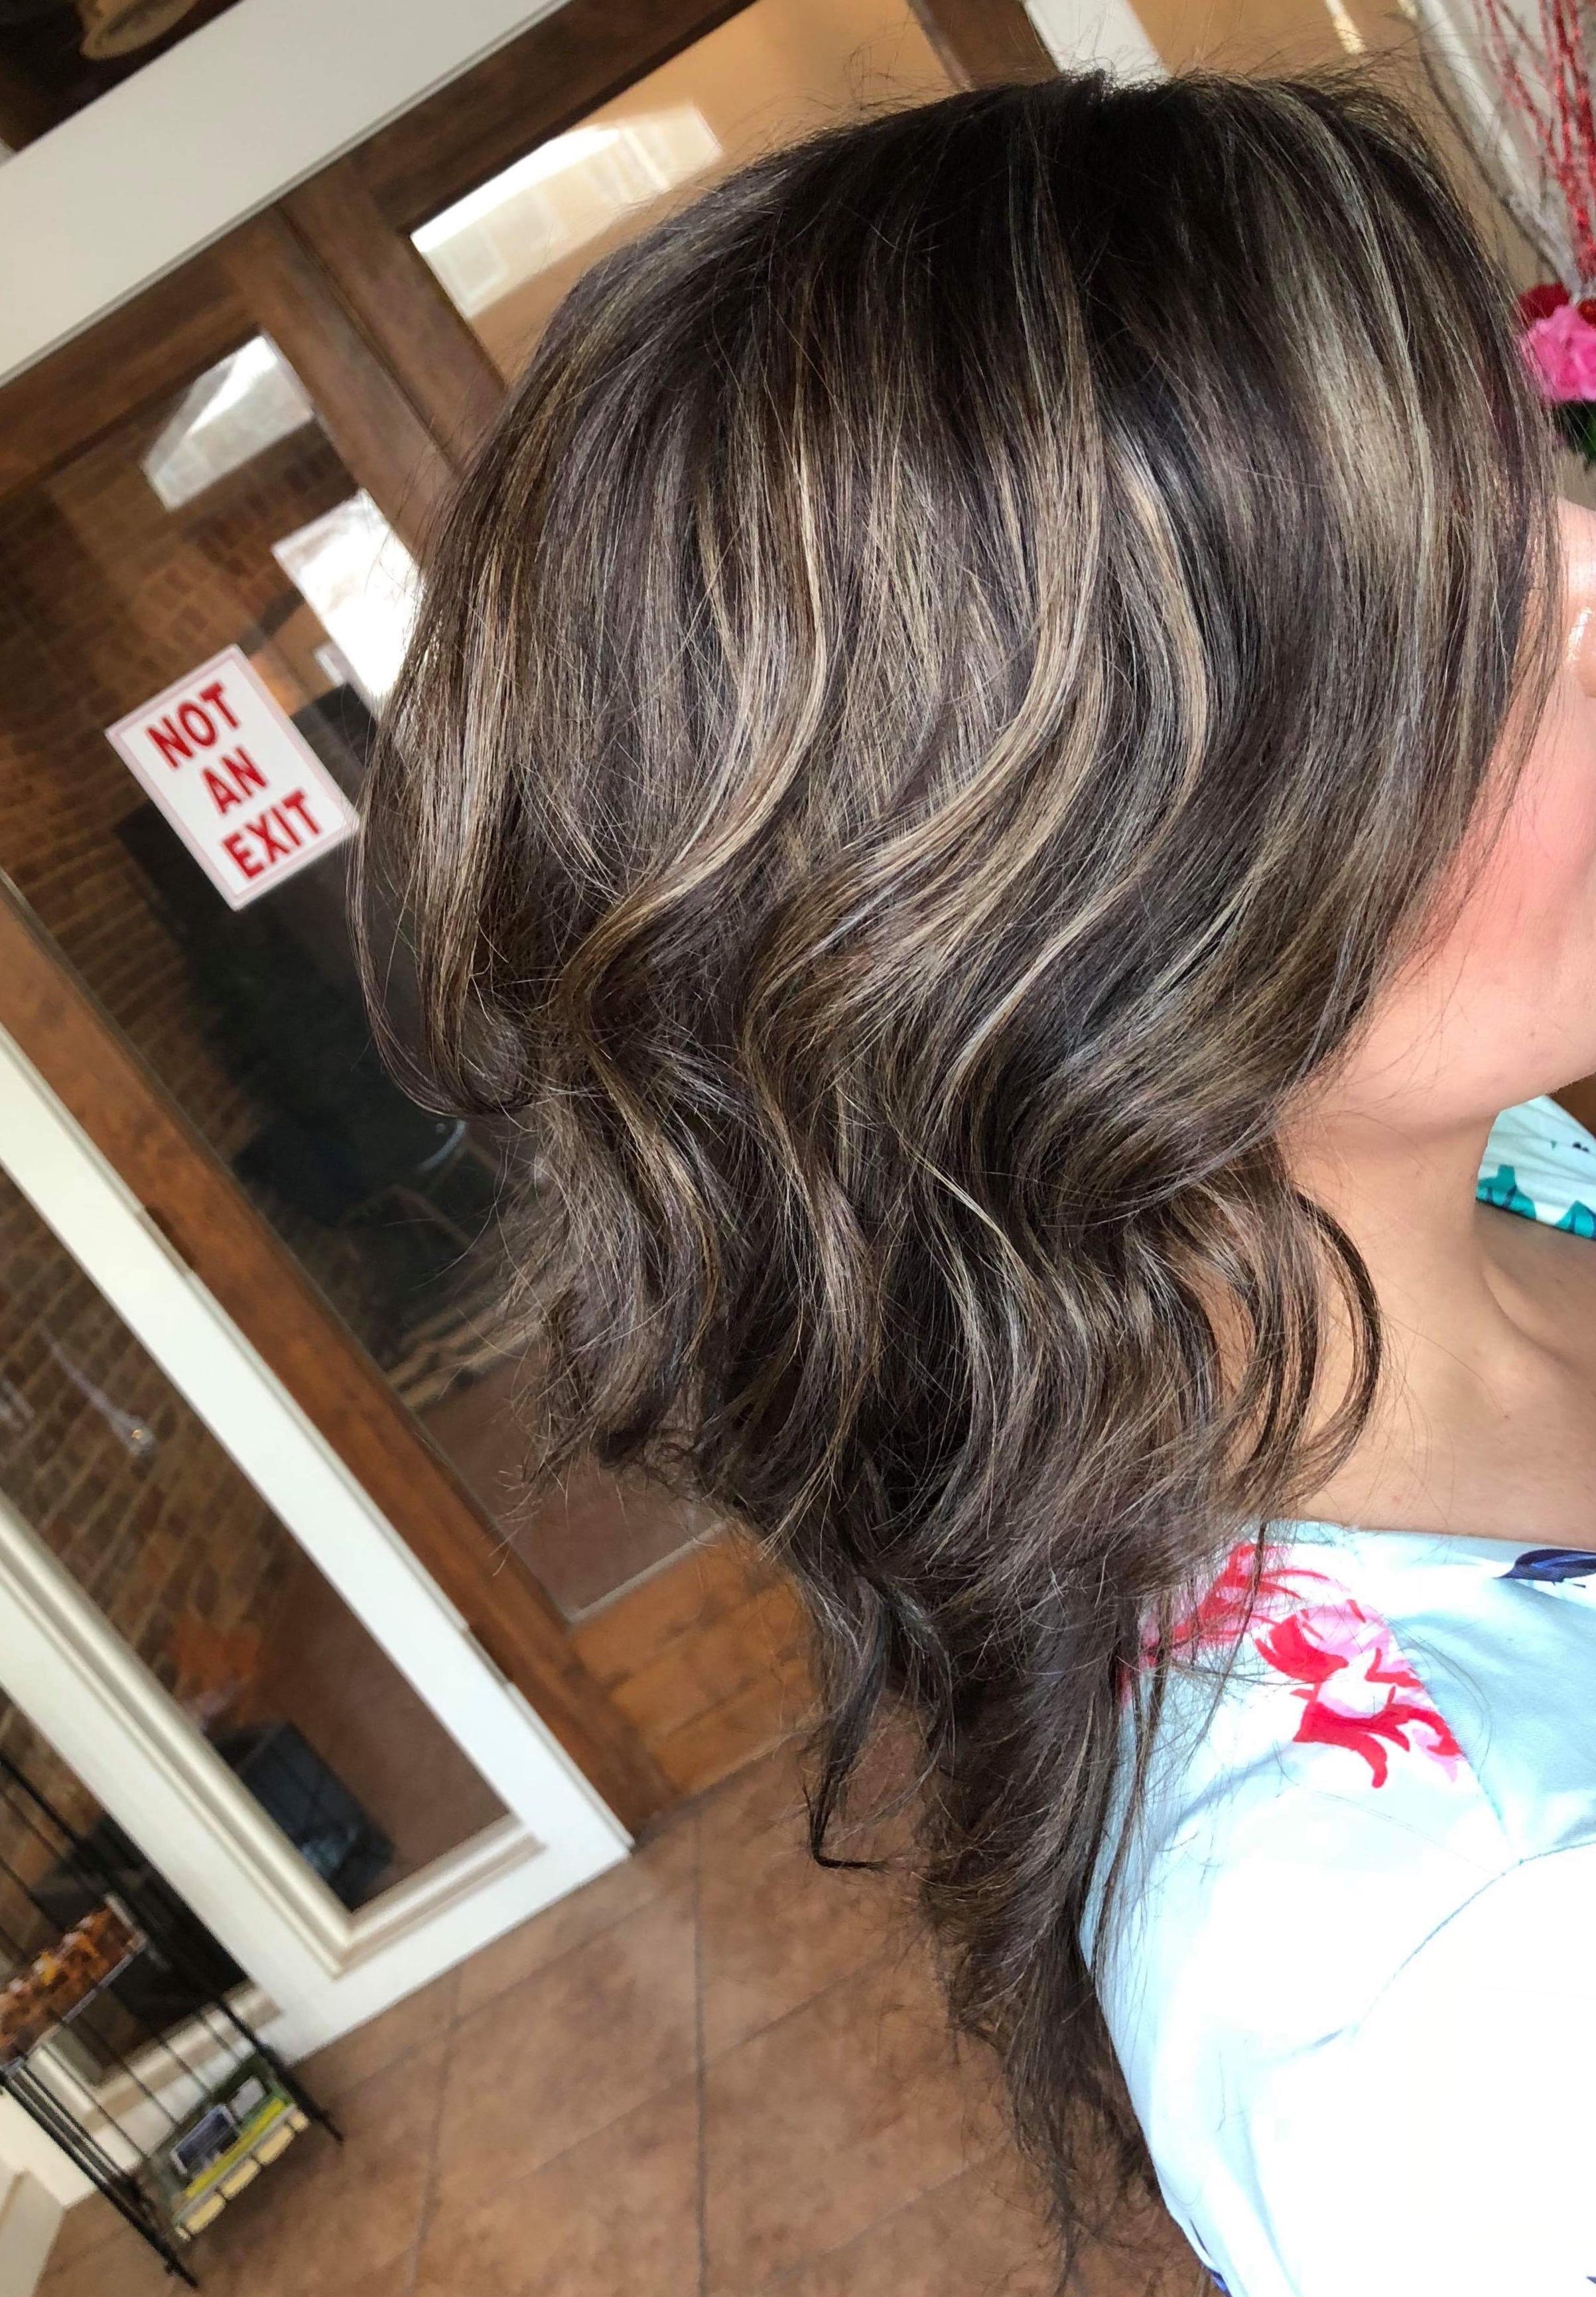 Top Hair Salons In Fayetteville Ar Famous Hair Salon 2018